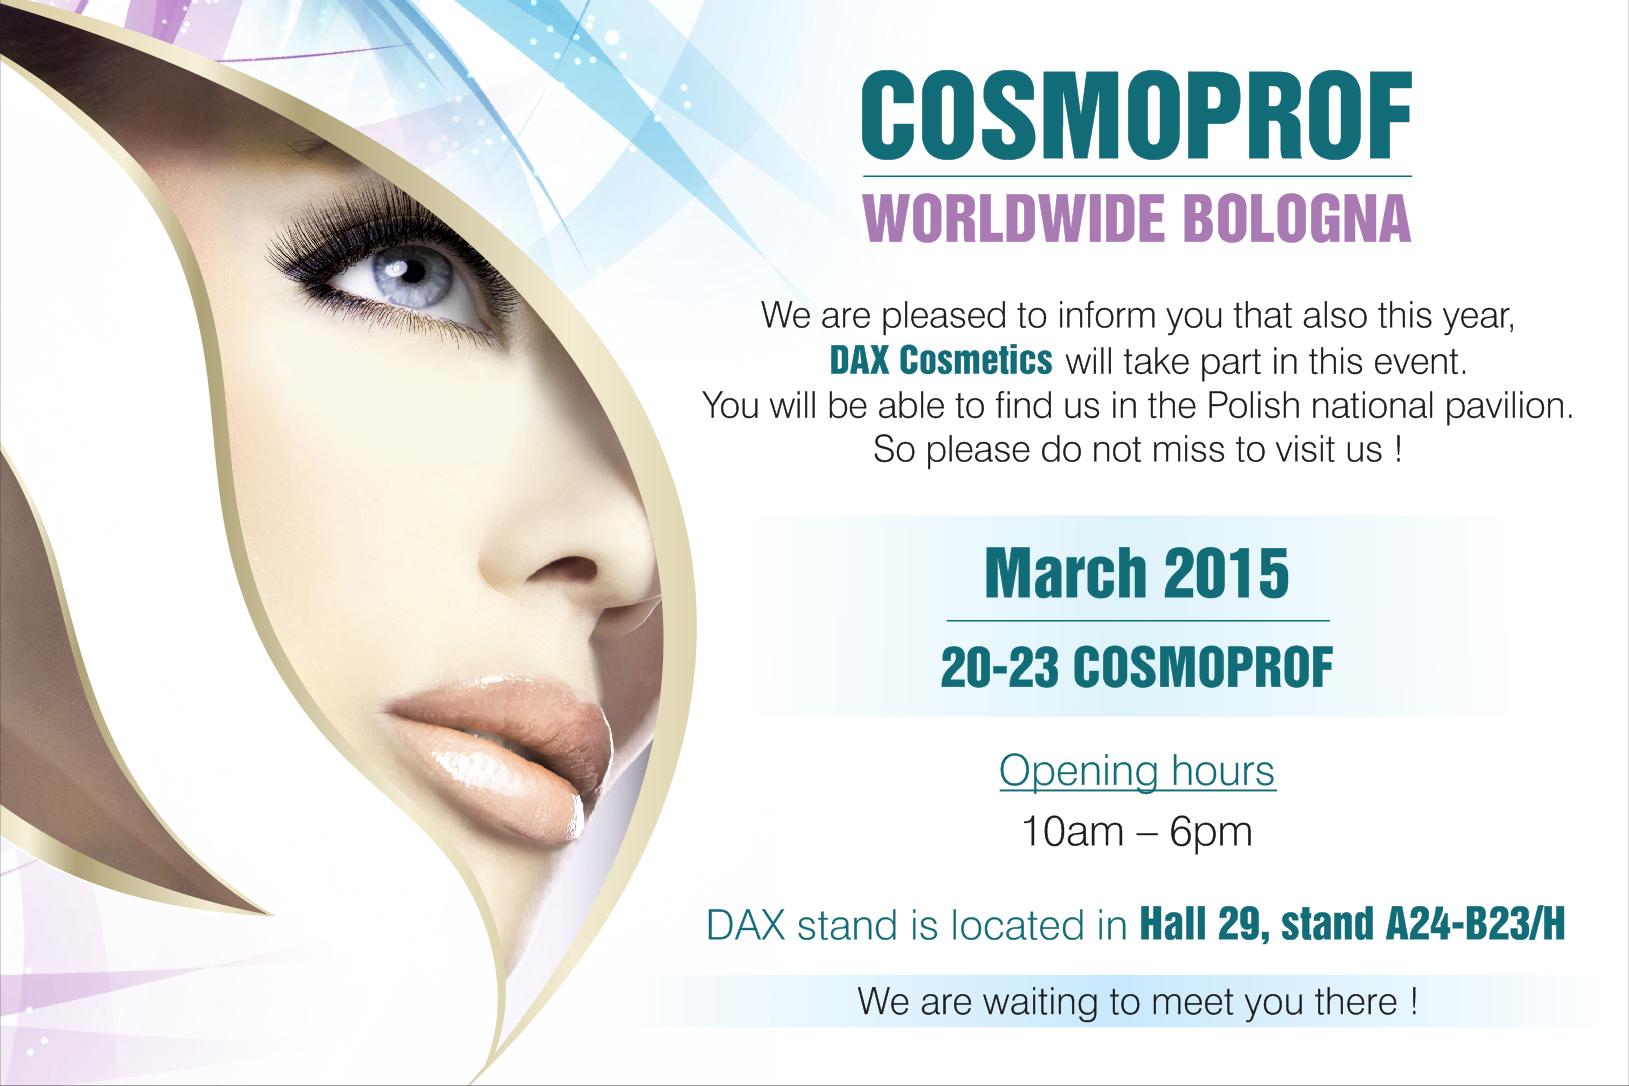 Zaproszenie na targi Cosmoprof 2015 20-23.03 Bolonia